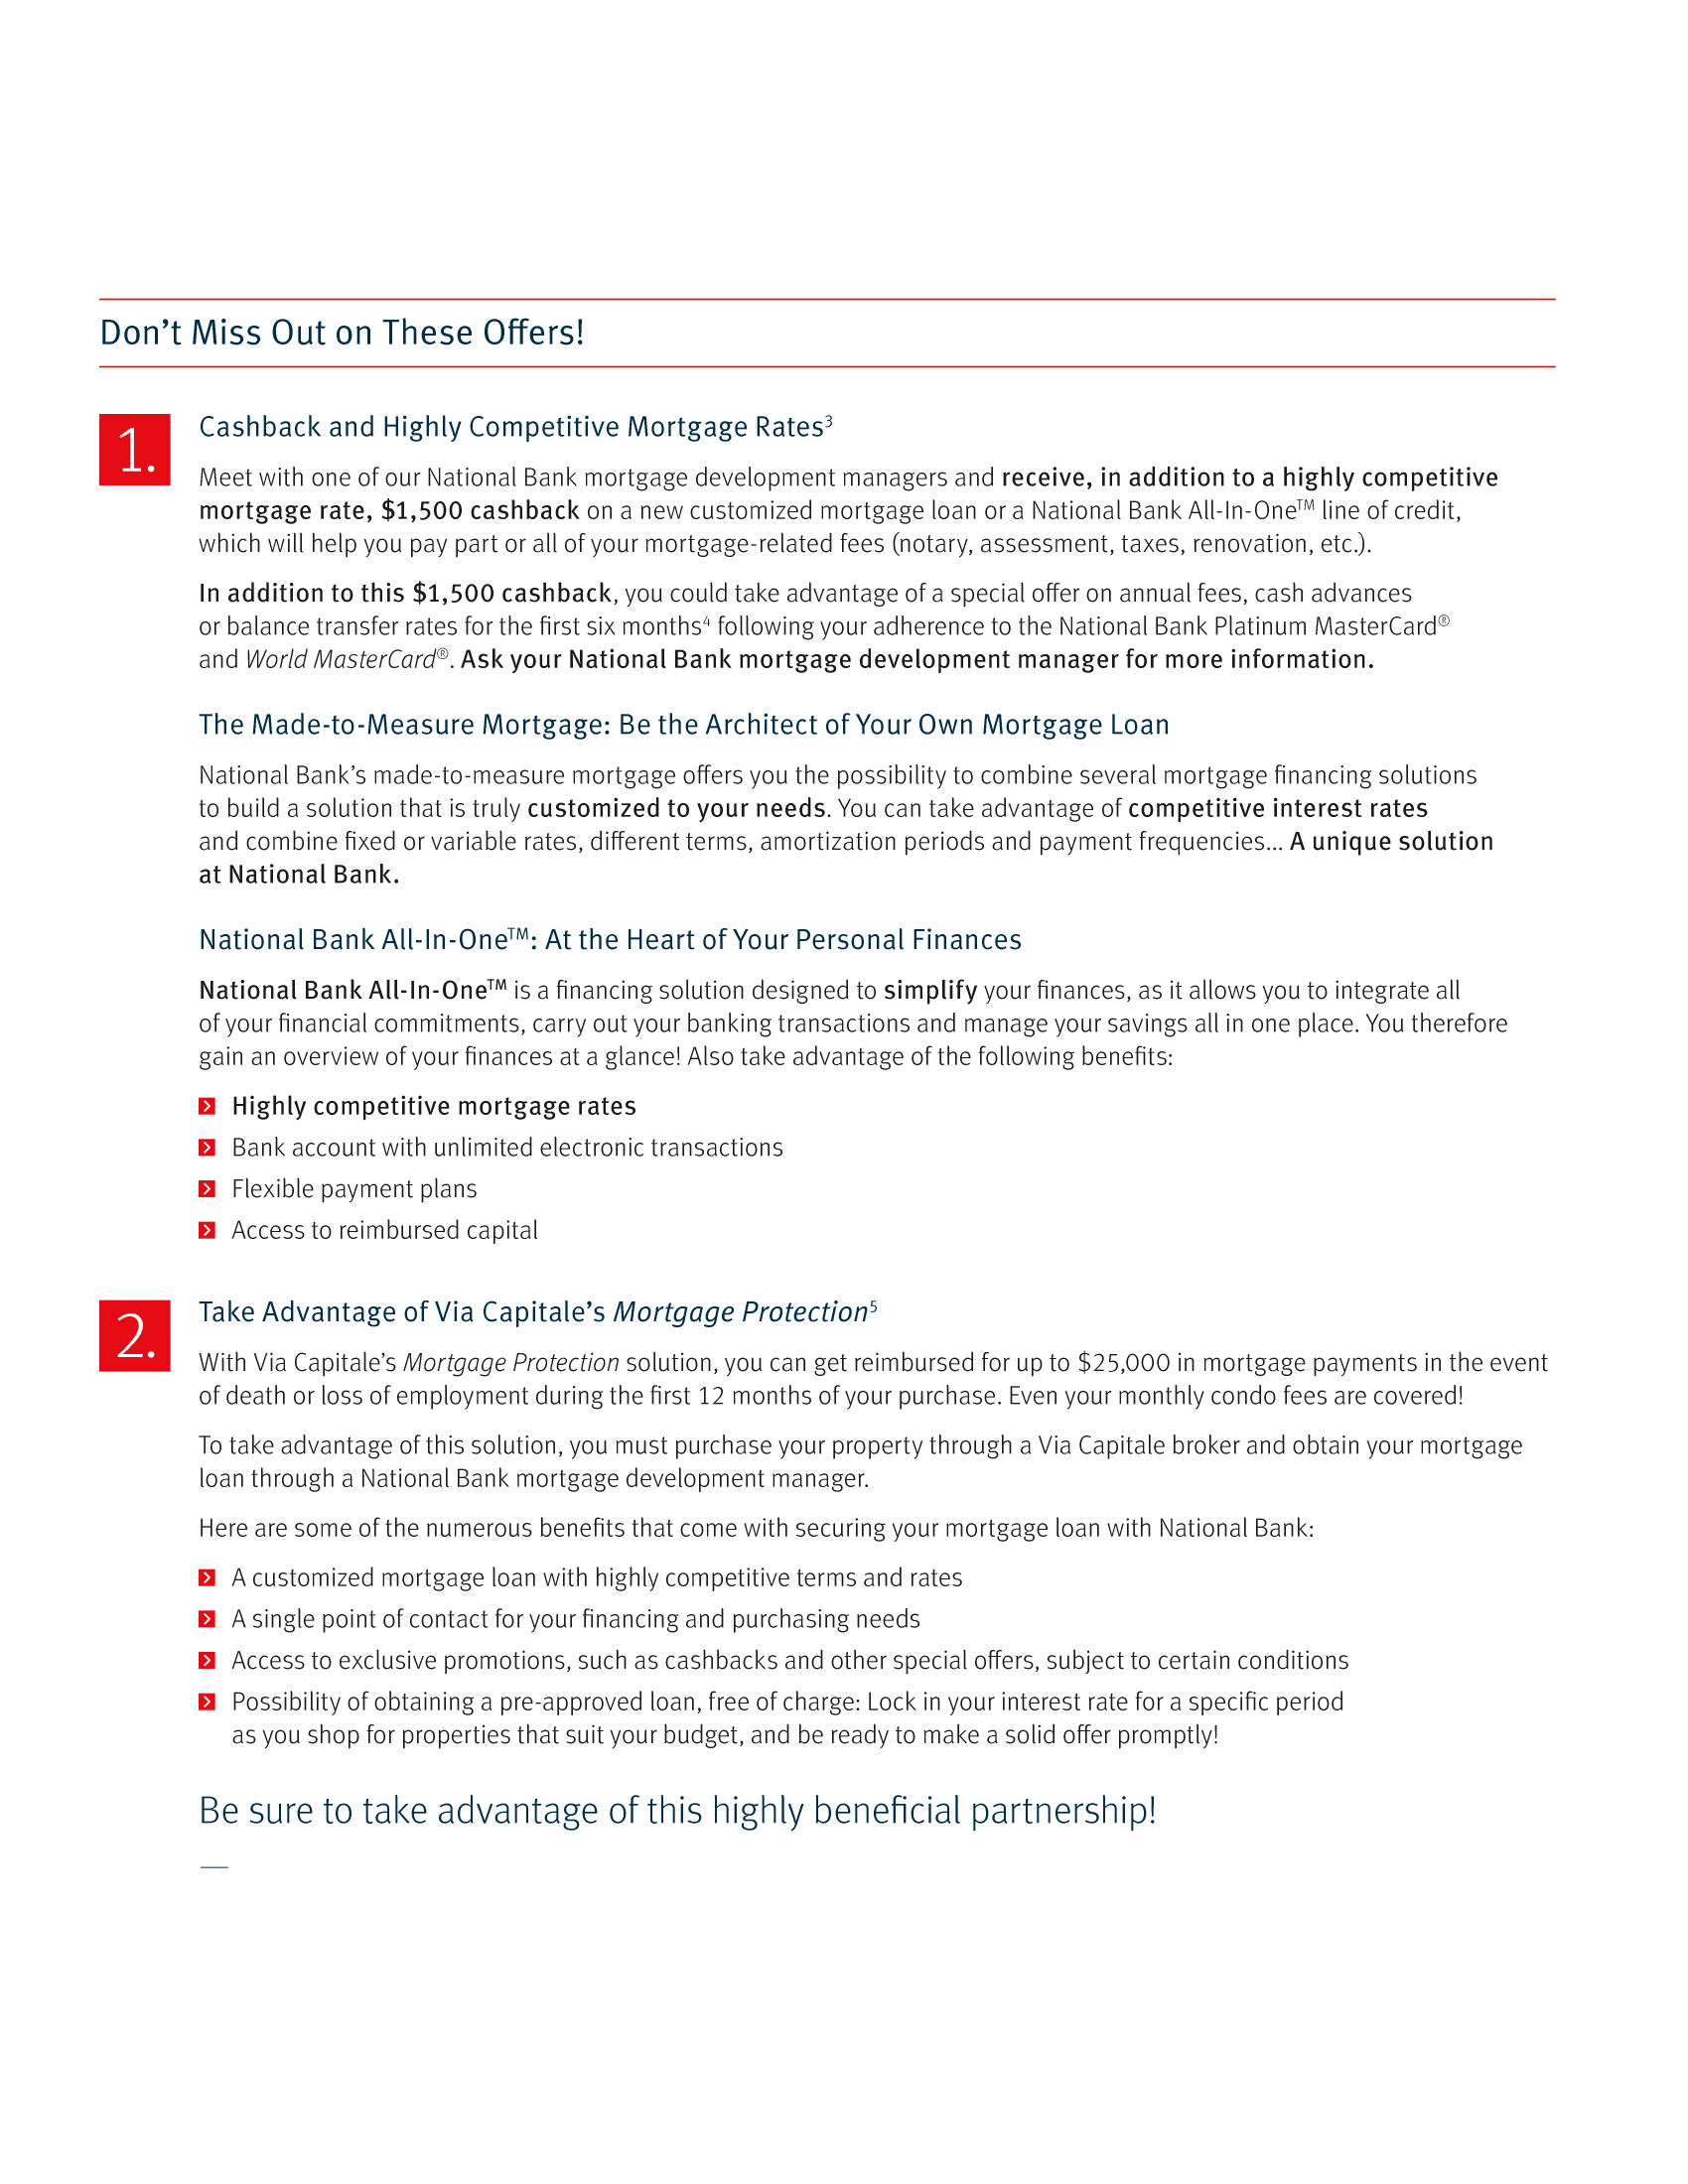 "3   Leaflet ""A Partnership with a Wealth of Advantages"" - Via Capitale"